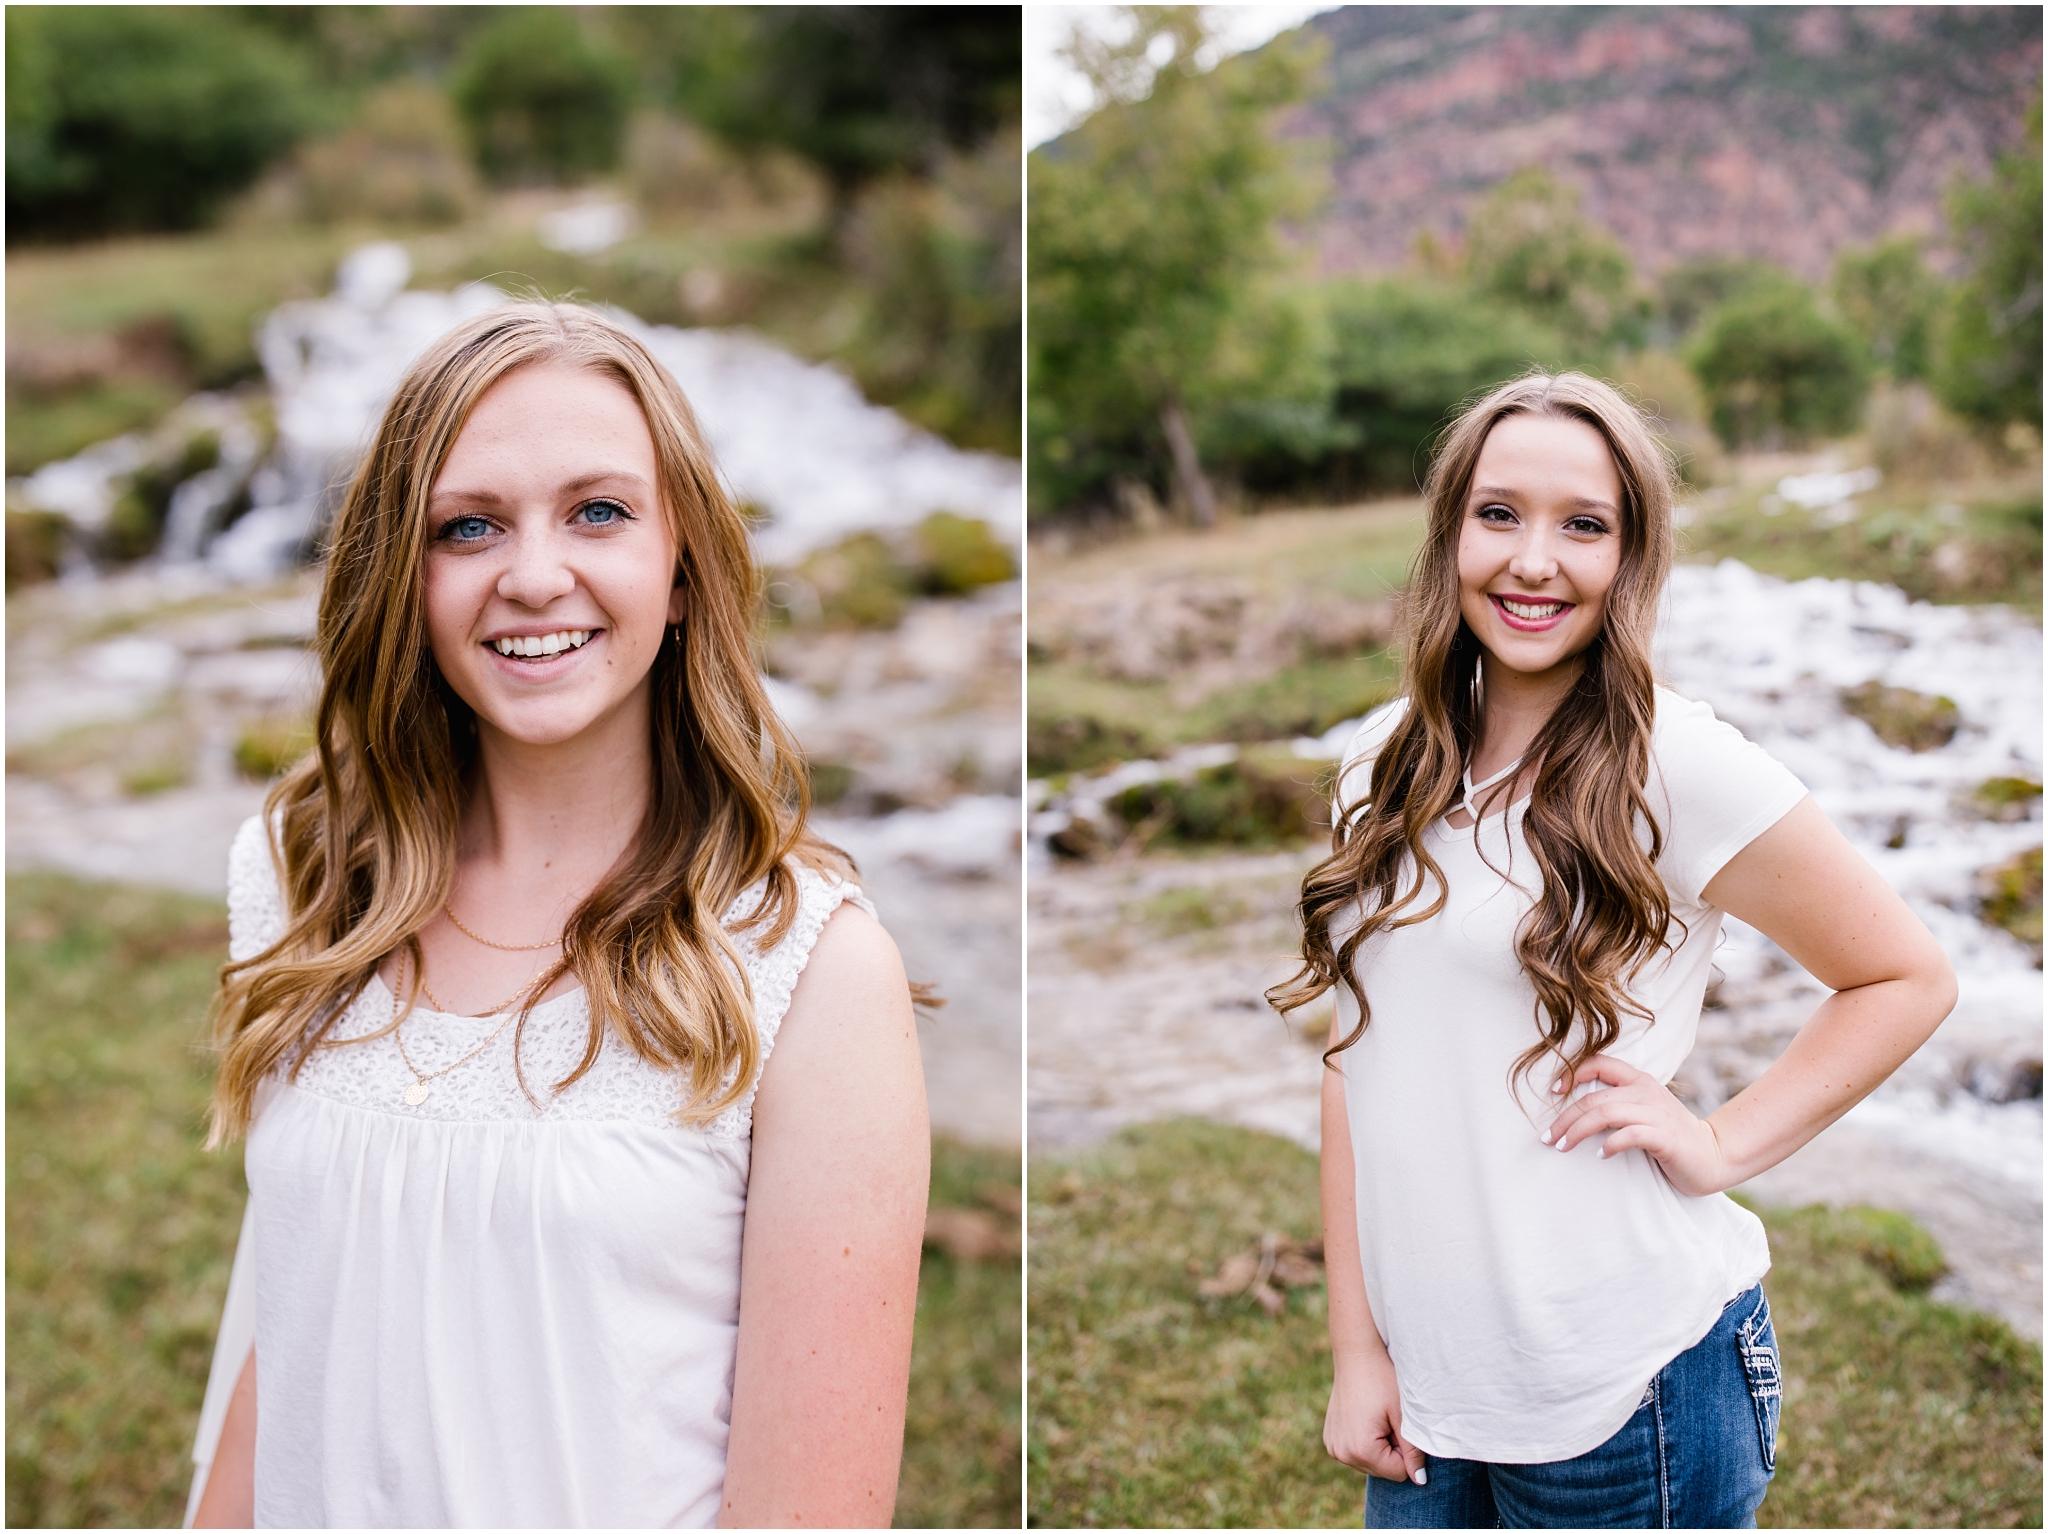 GVHSDRILL-81_Lizzie-B-Imagery-Utah-Family-Photographer-Central-Utah-Park-City-Salt-Lake-City-Drill-Team-Photography-Dance.jpg